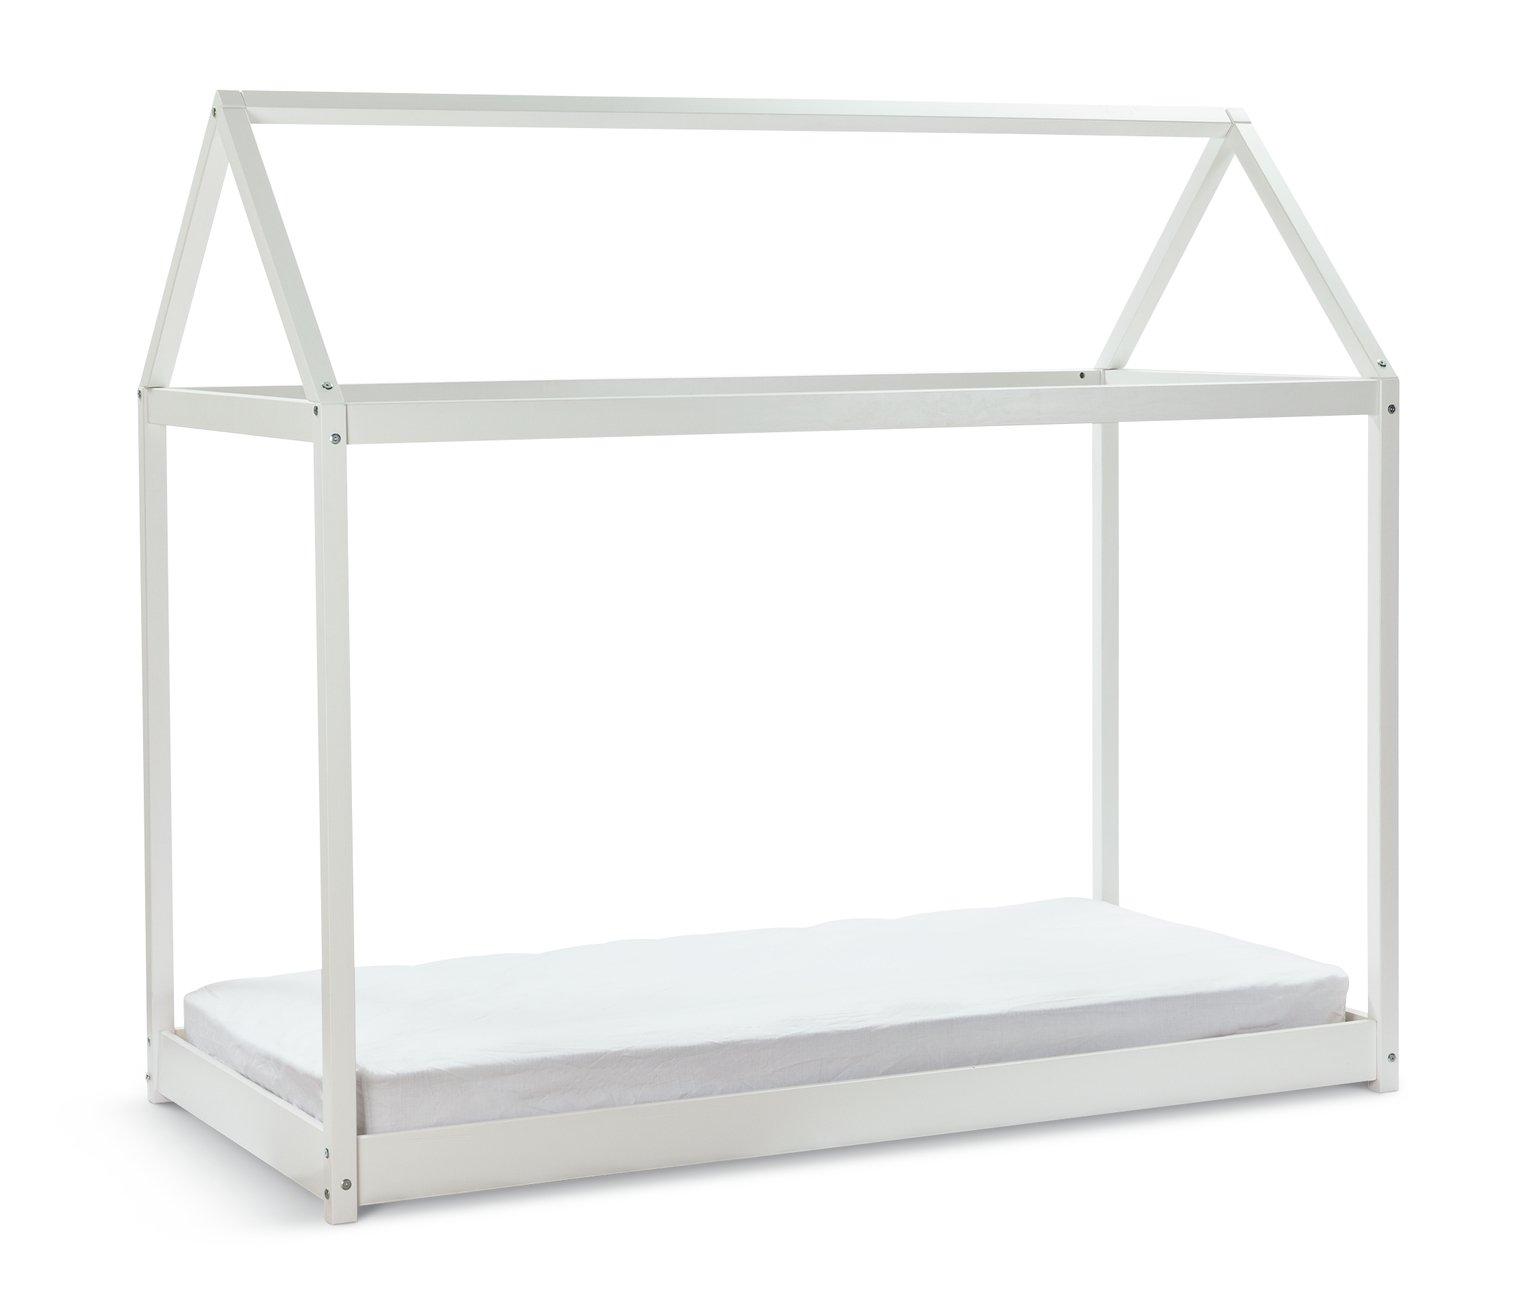 Habitat House Single Bed Frame and Kids Mattress - White